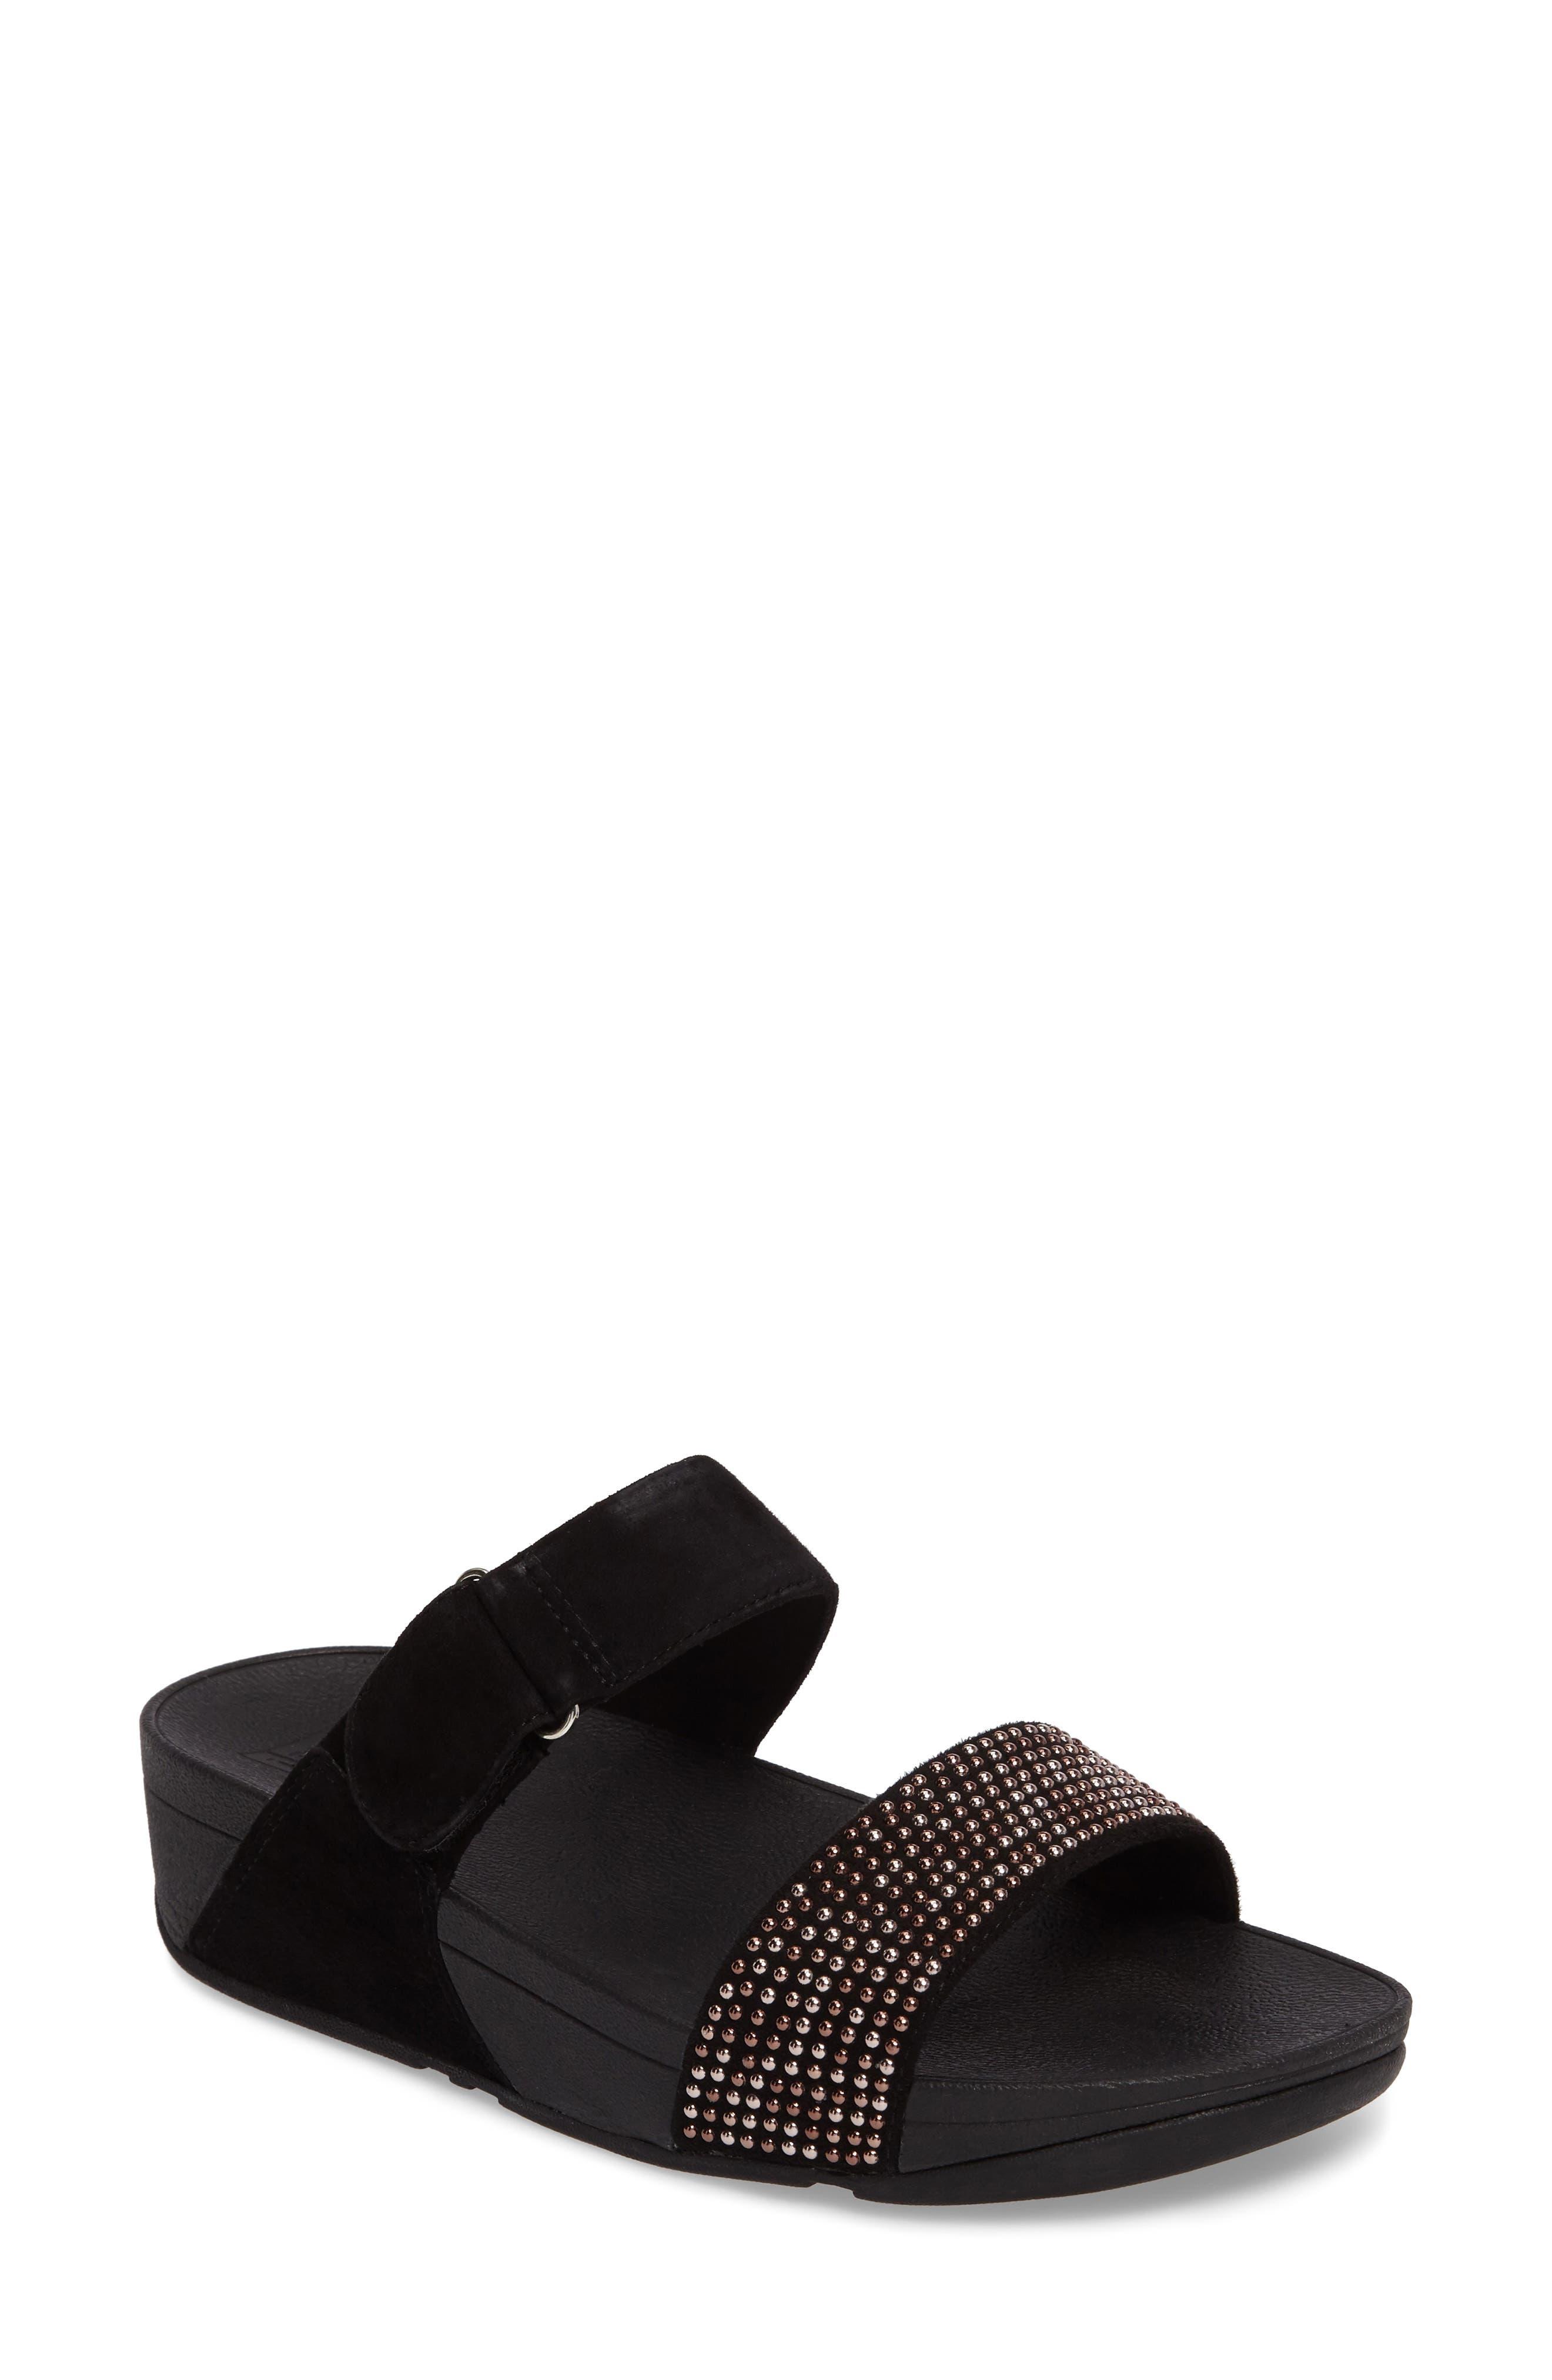 Lulu Popstud Wedge Slide Sandal,                             Main thumbnail 1, color,                             Black Fabric